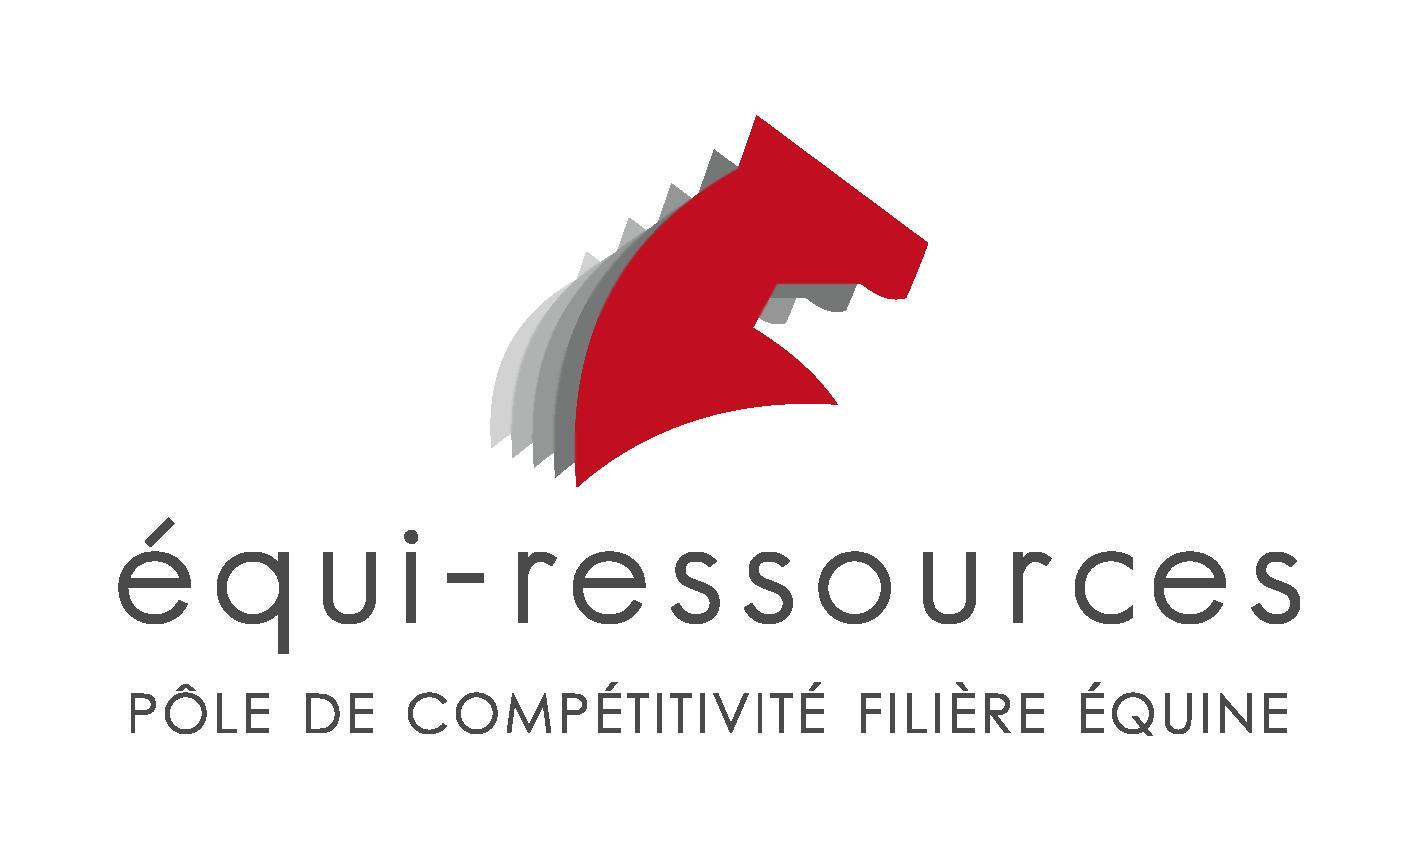 Bilan des offres d'emploi Equiressources au 31 octobre 2017